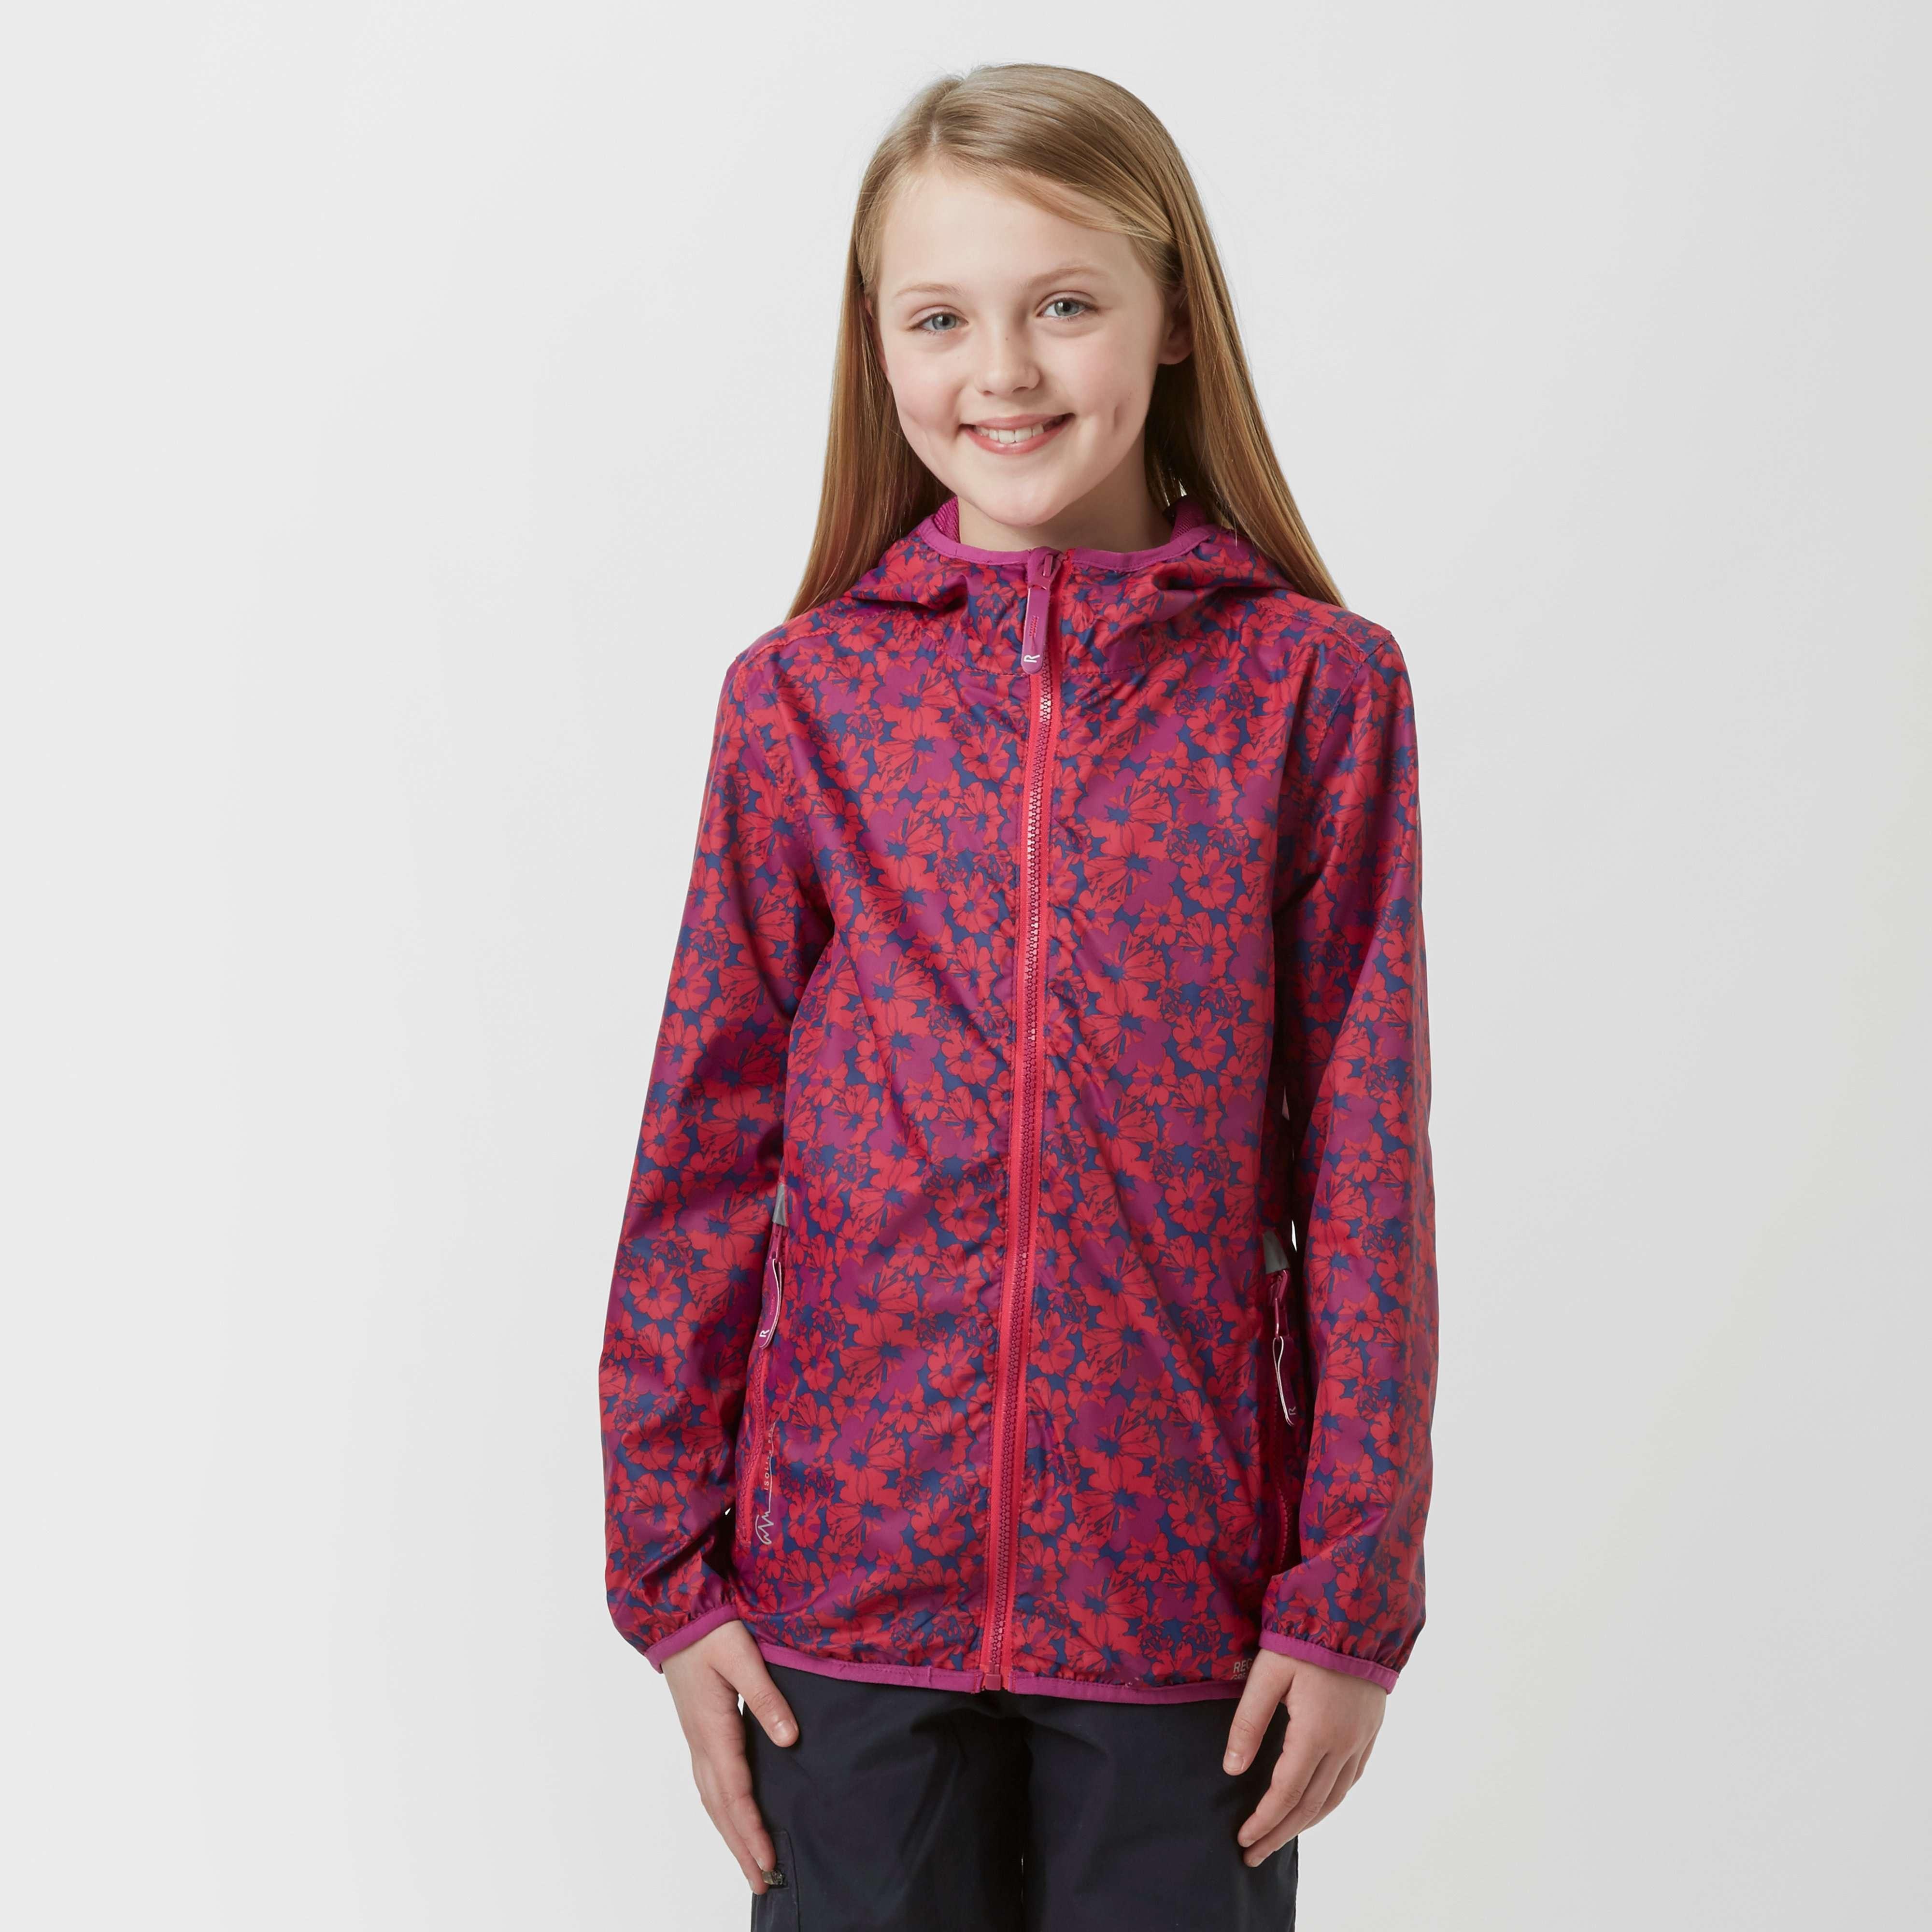 REGATTA Girl's Lever II Jacket